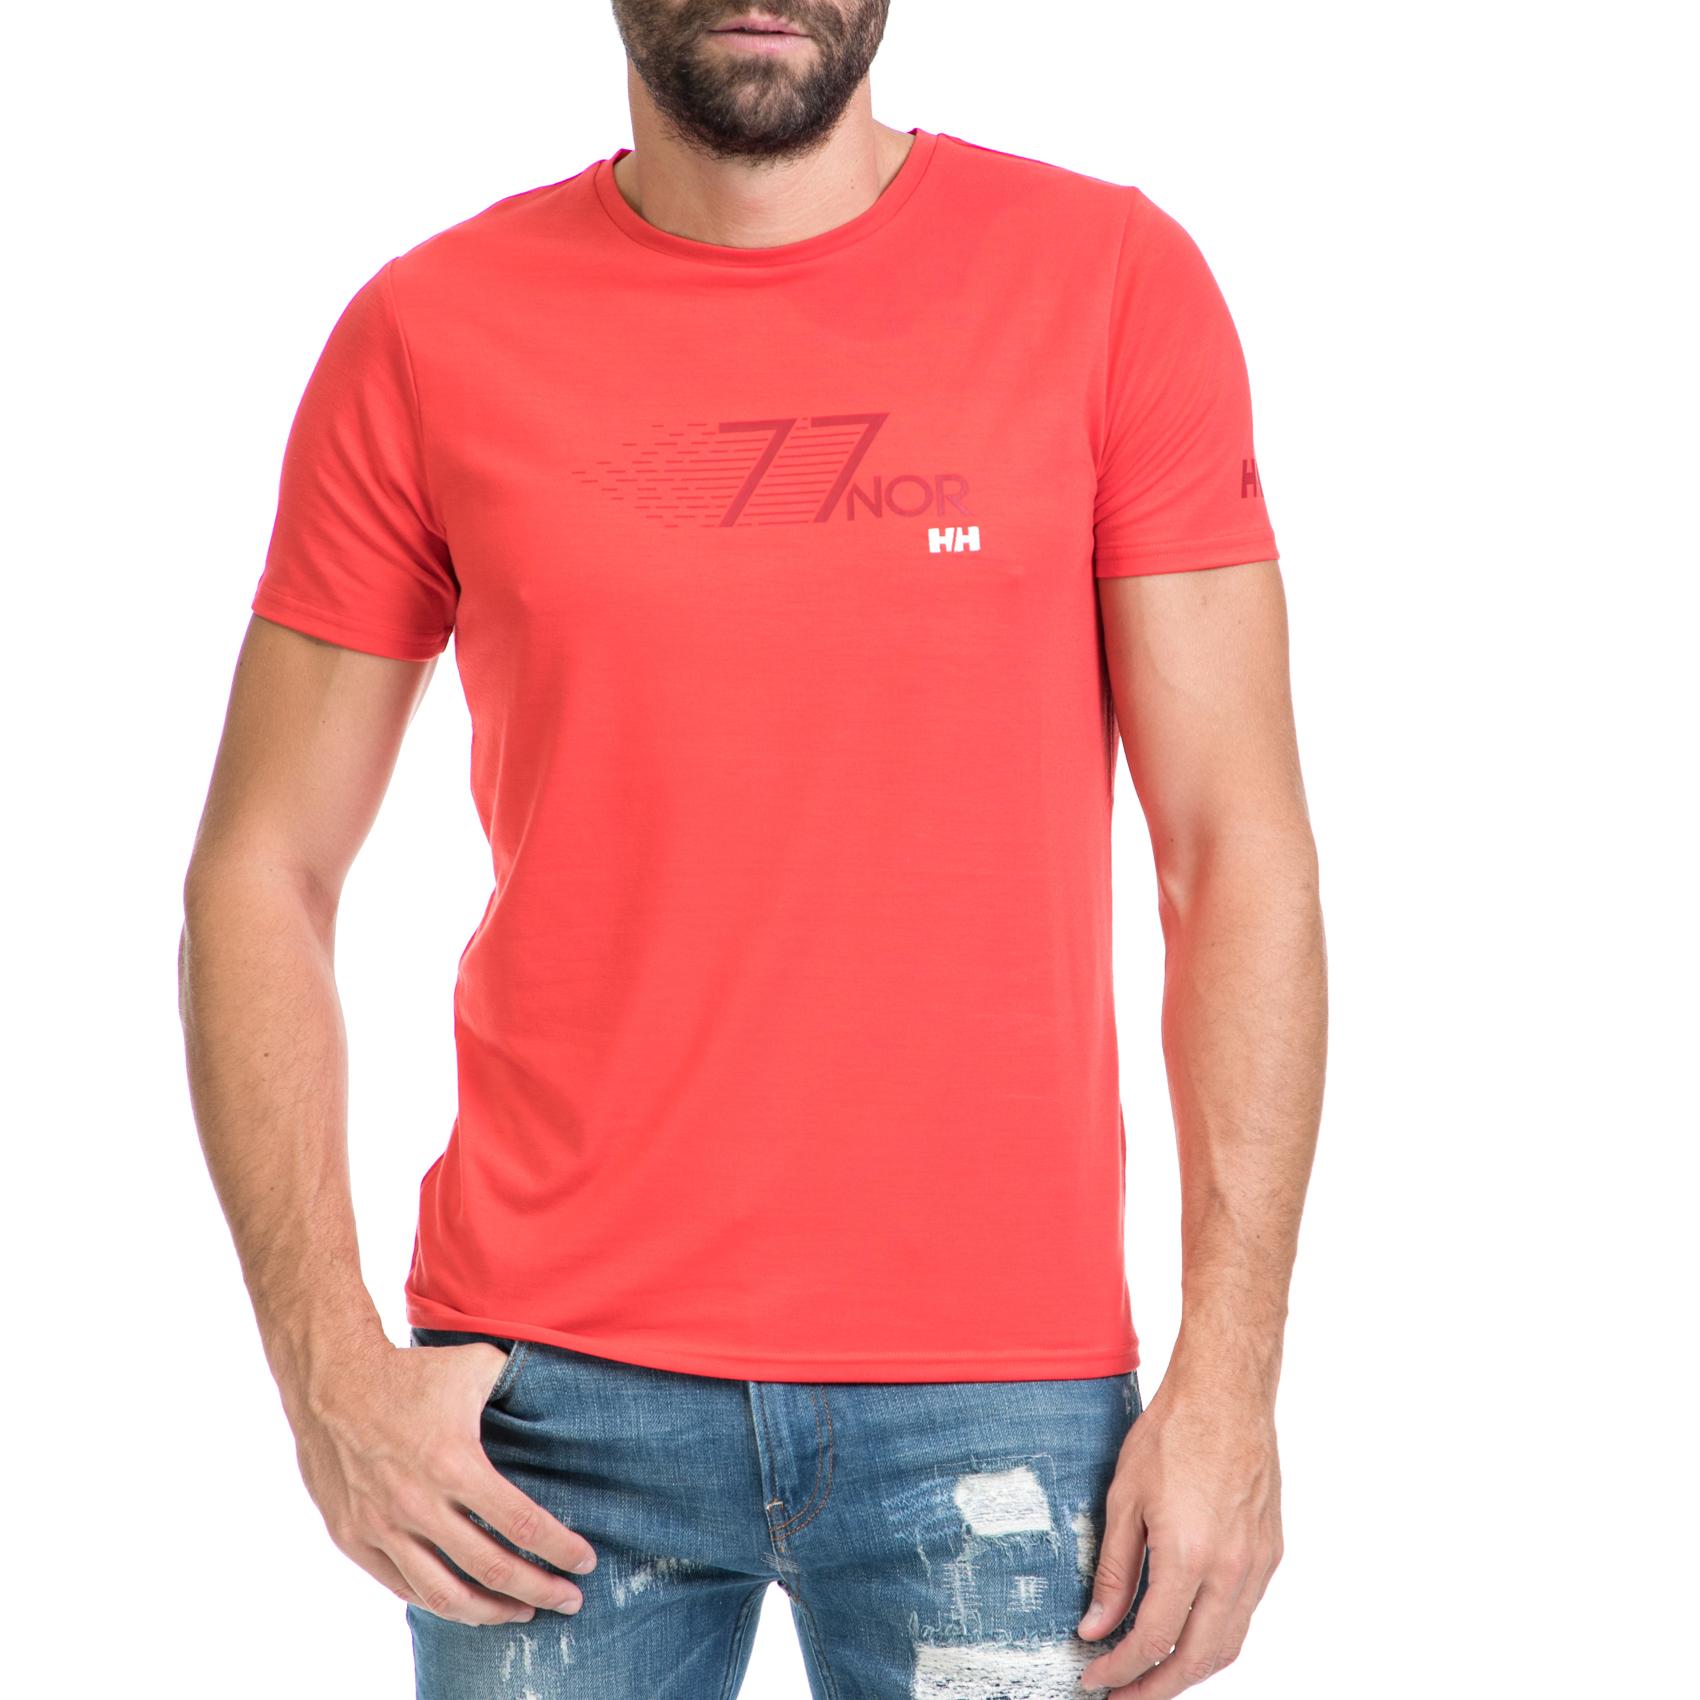 HELLY HANSEN - Ανδρική μπλούζα SHORE κόκκινη ανδρικά ρούχα αθλητικά t shirt